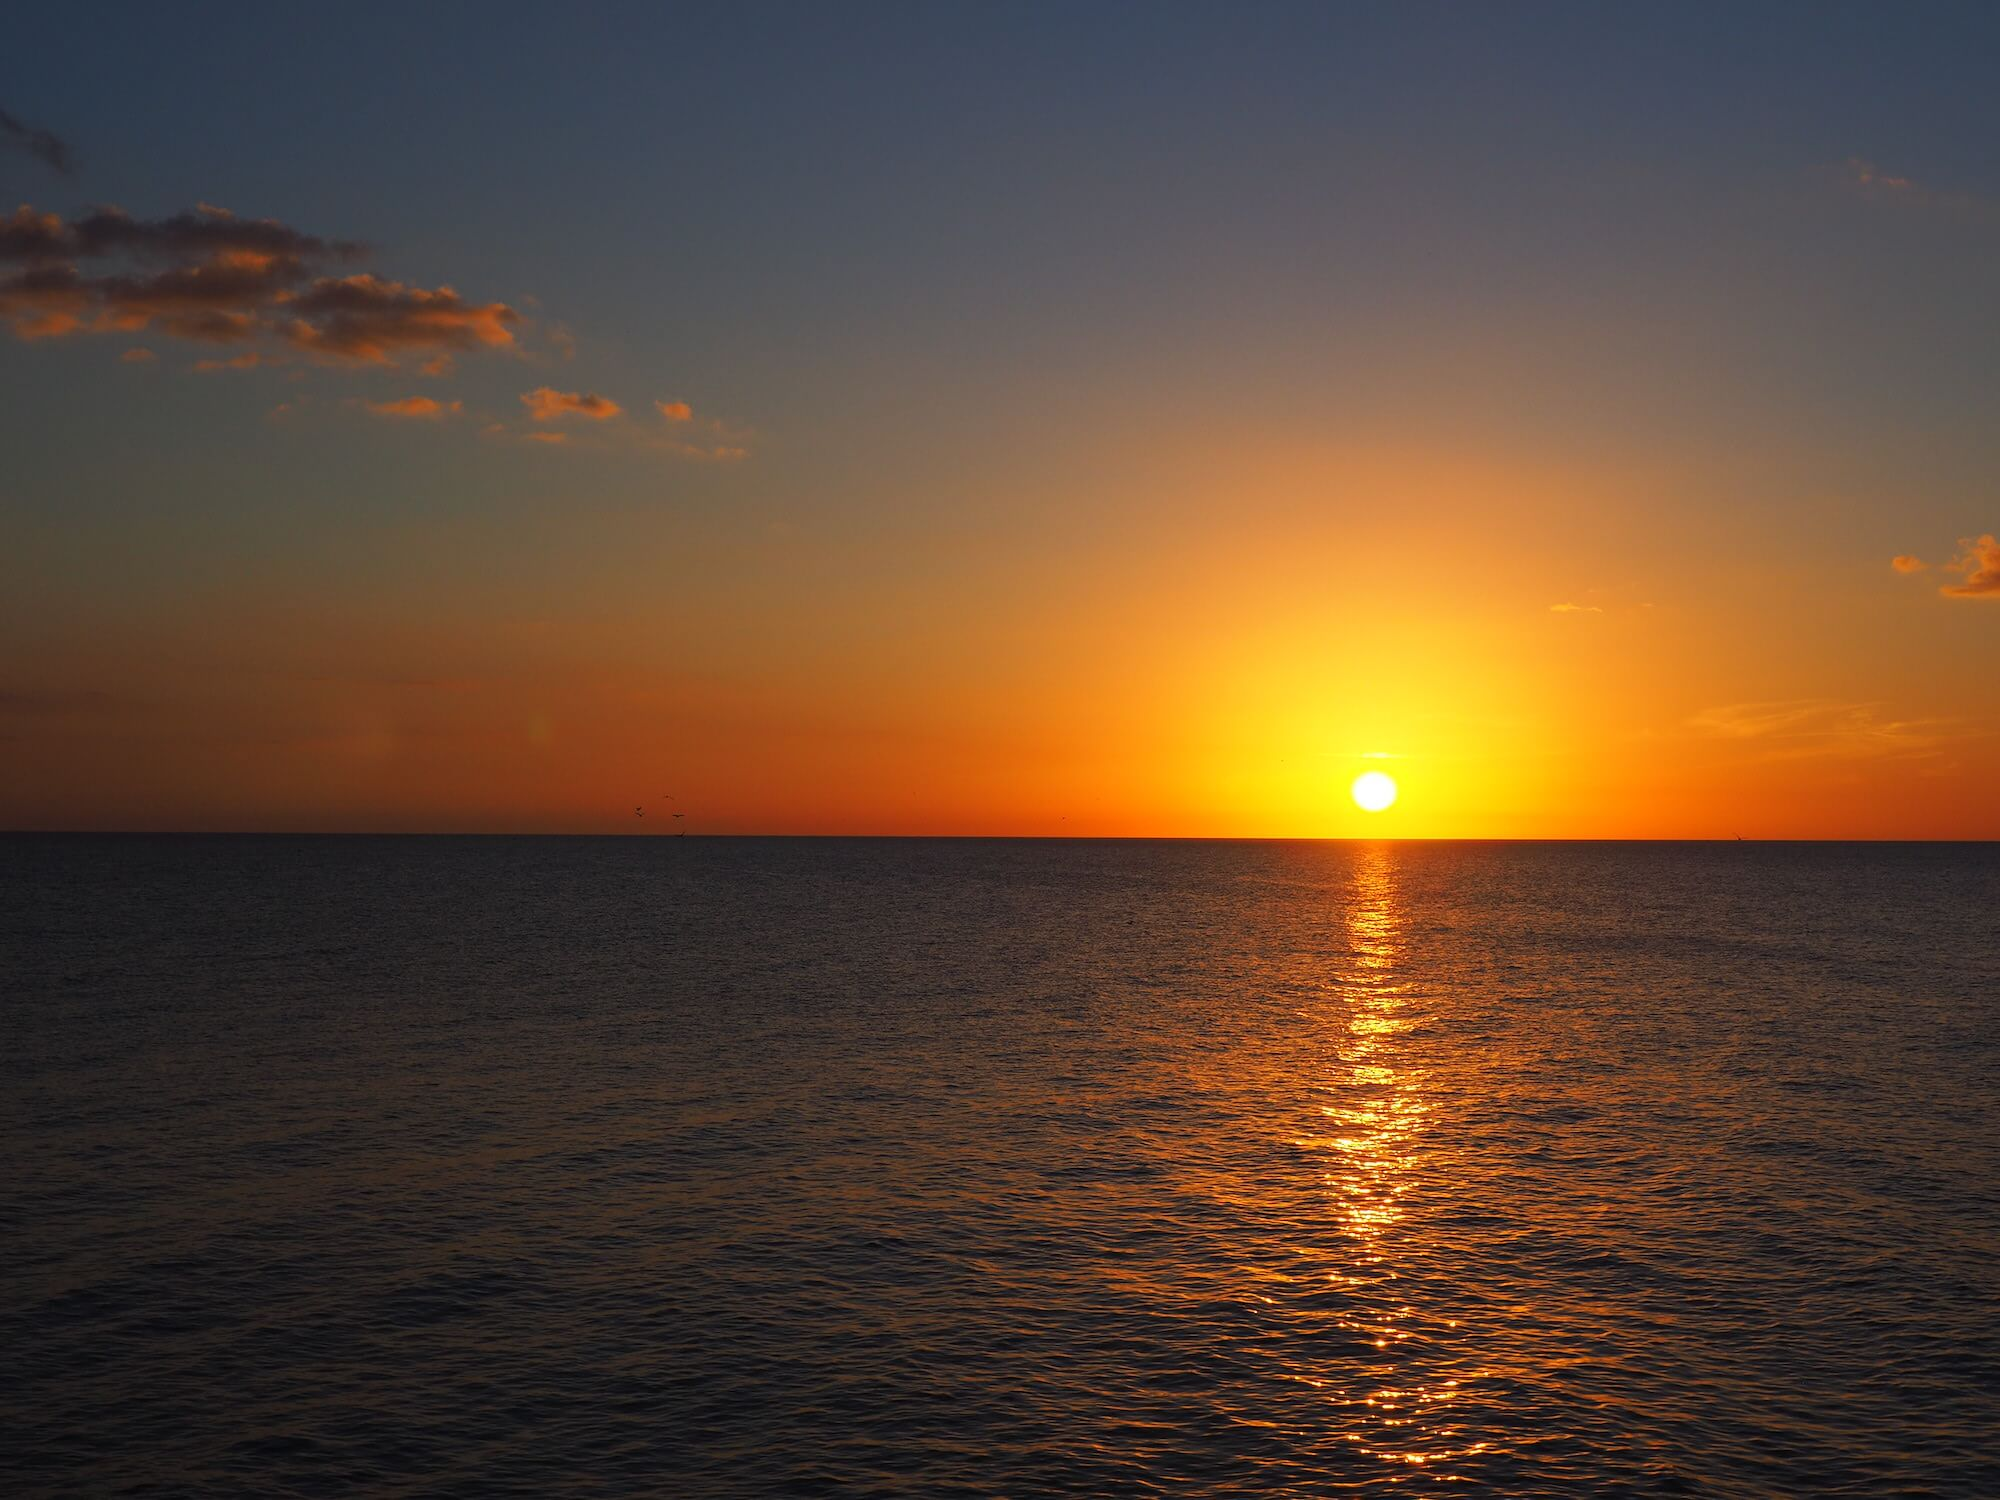 Sonnenuntergang in Naples